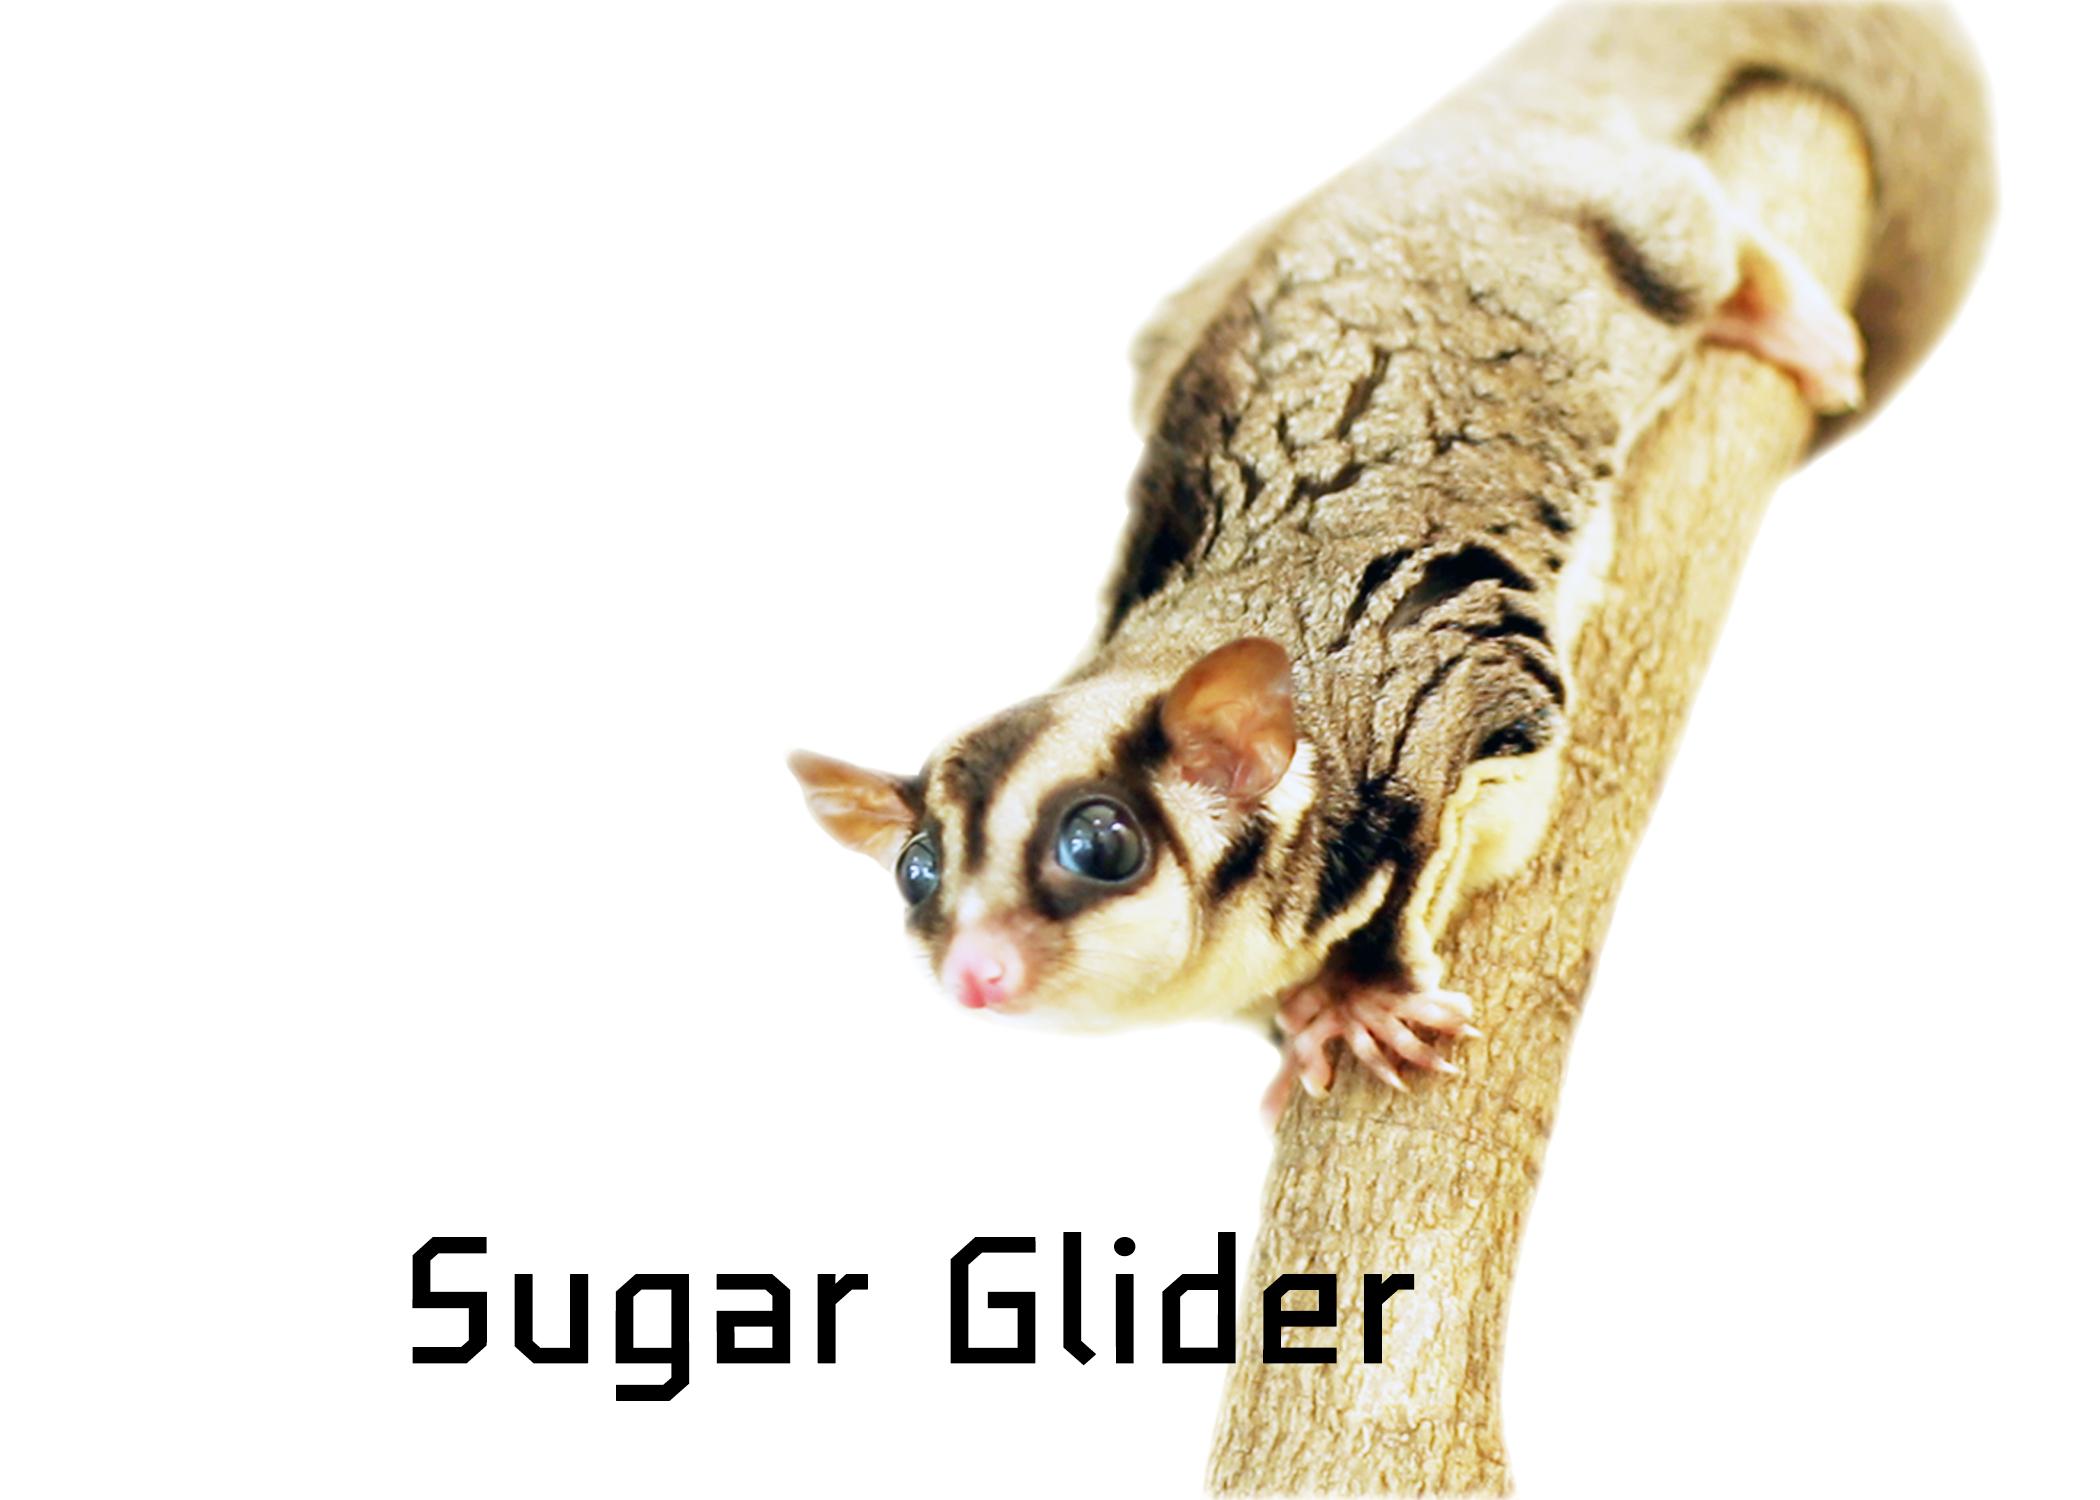 Sugar Glider ซูการ์ไกรเดอร์